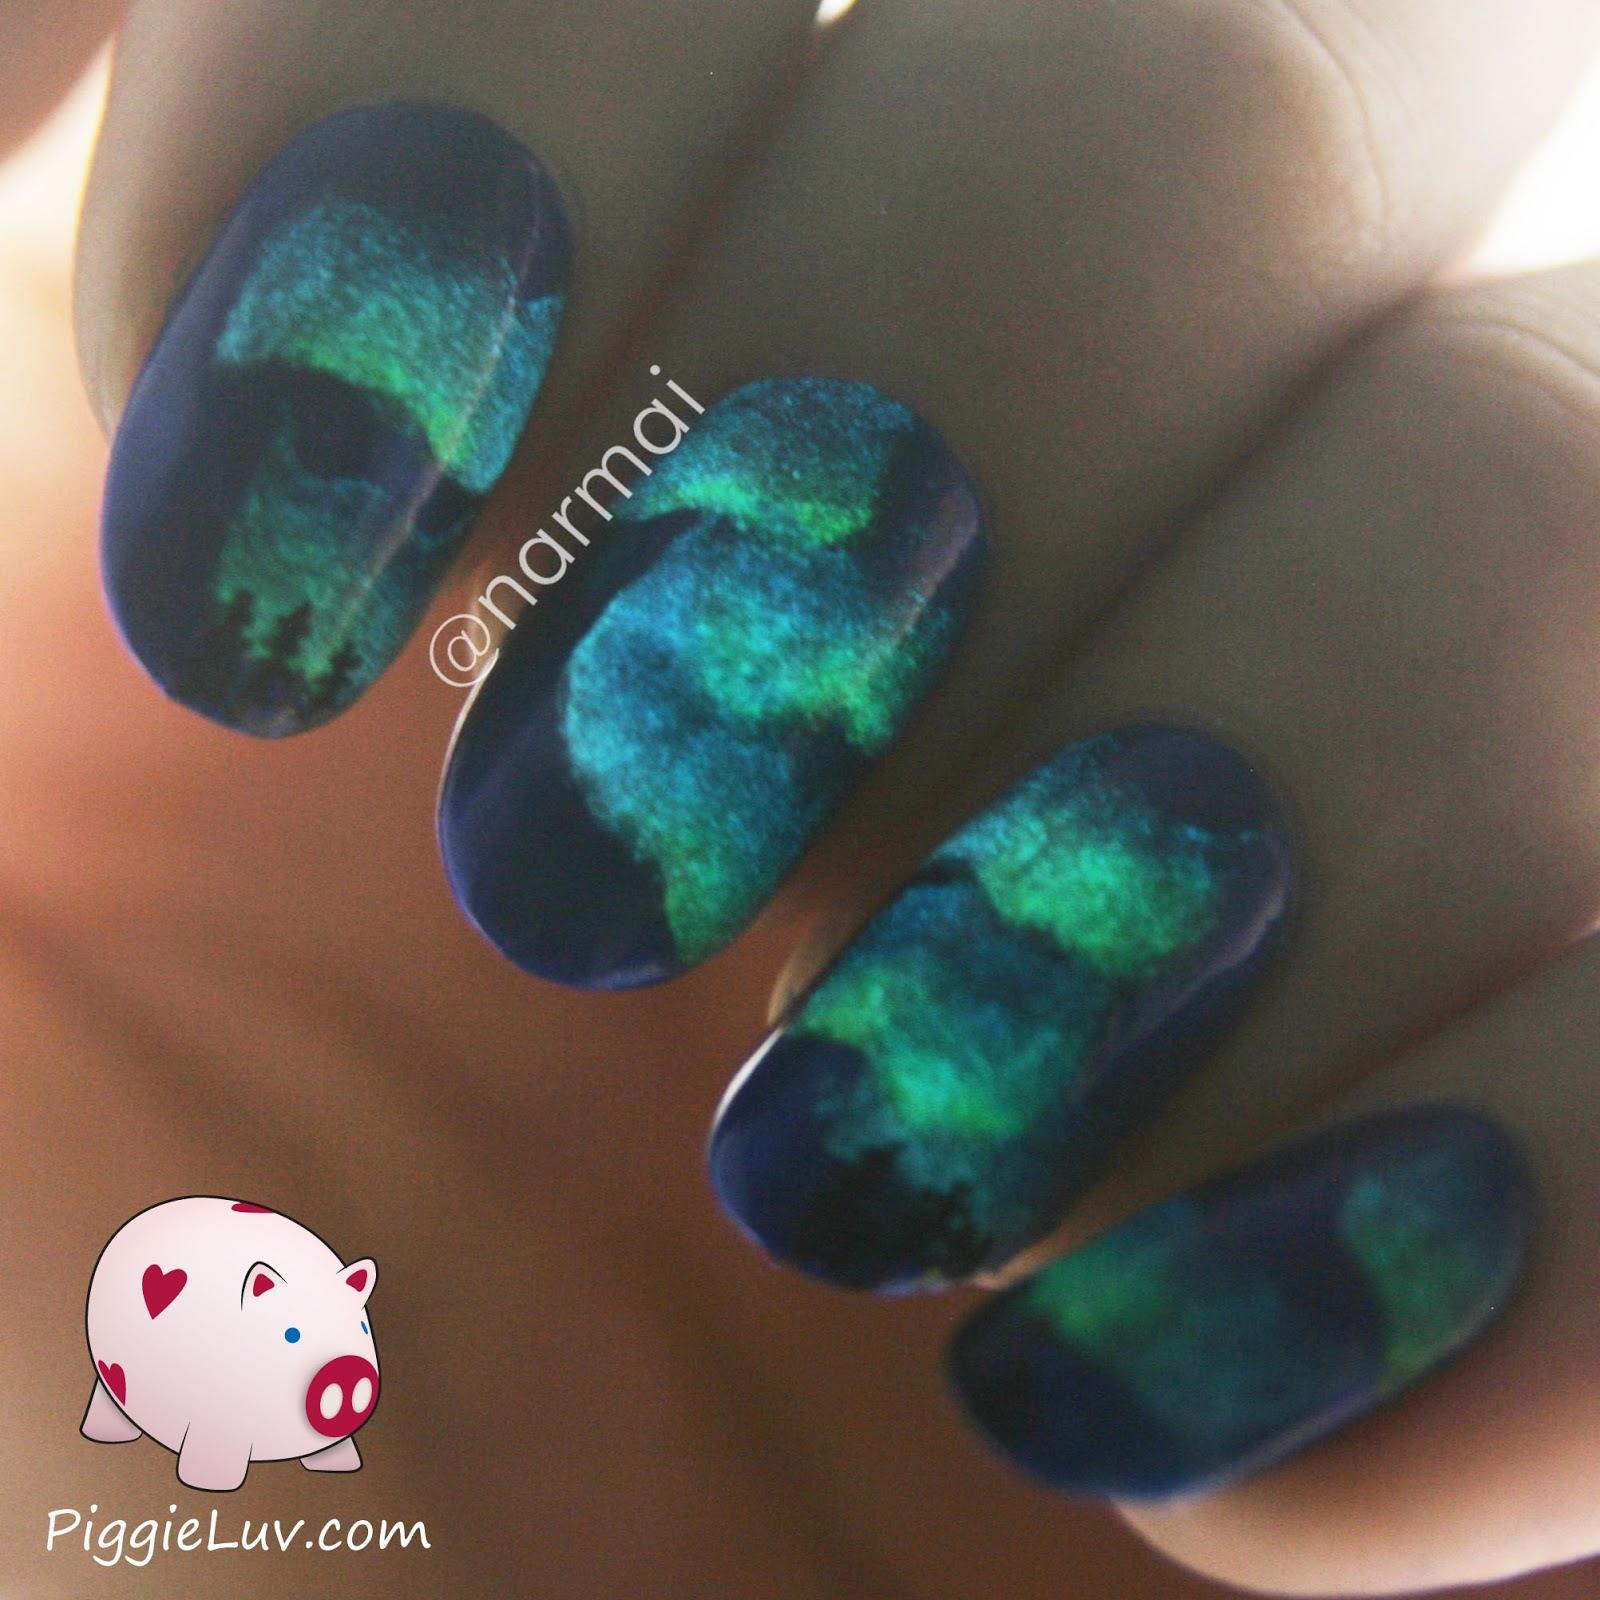 PiggieLuv: Northern lights glow in the dark nail art + video tutorial!